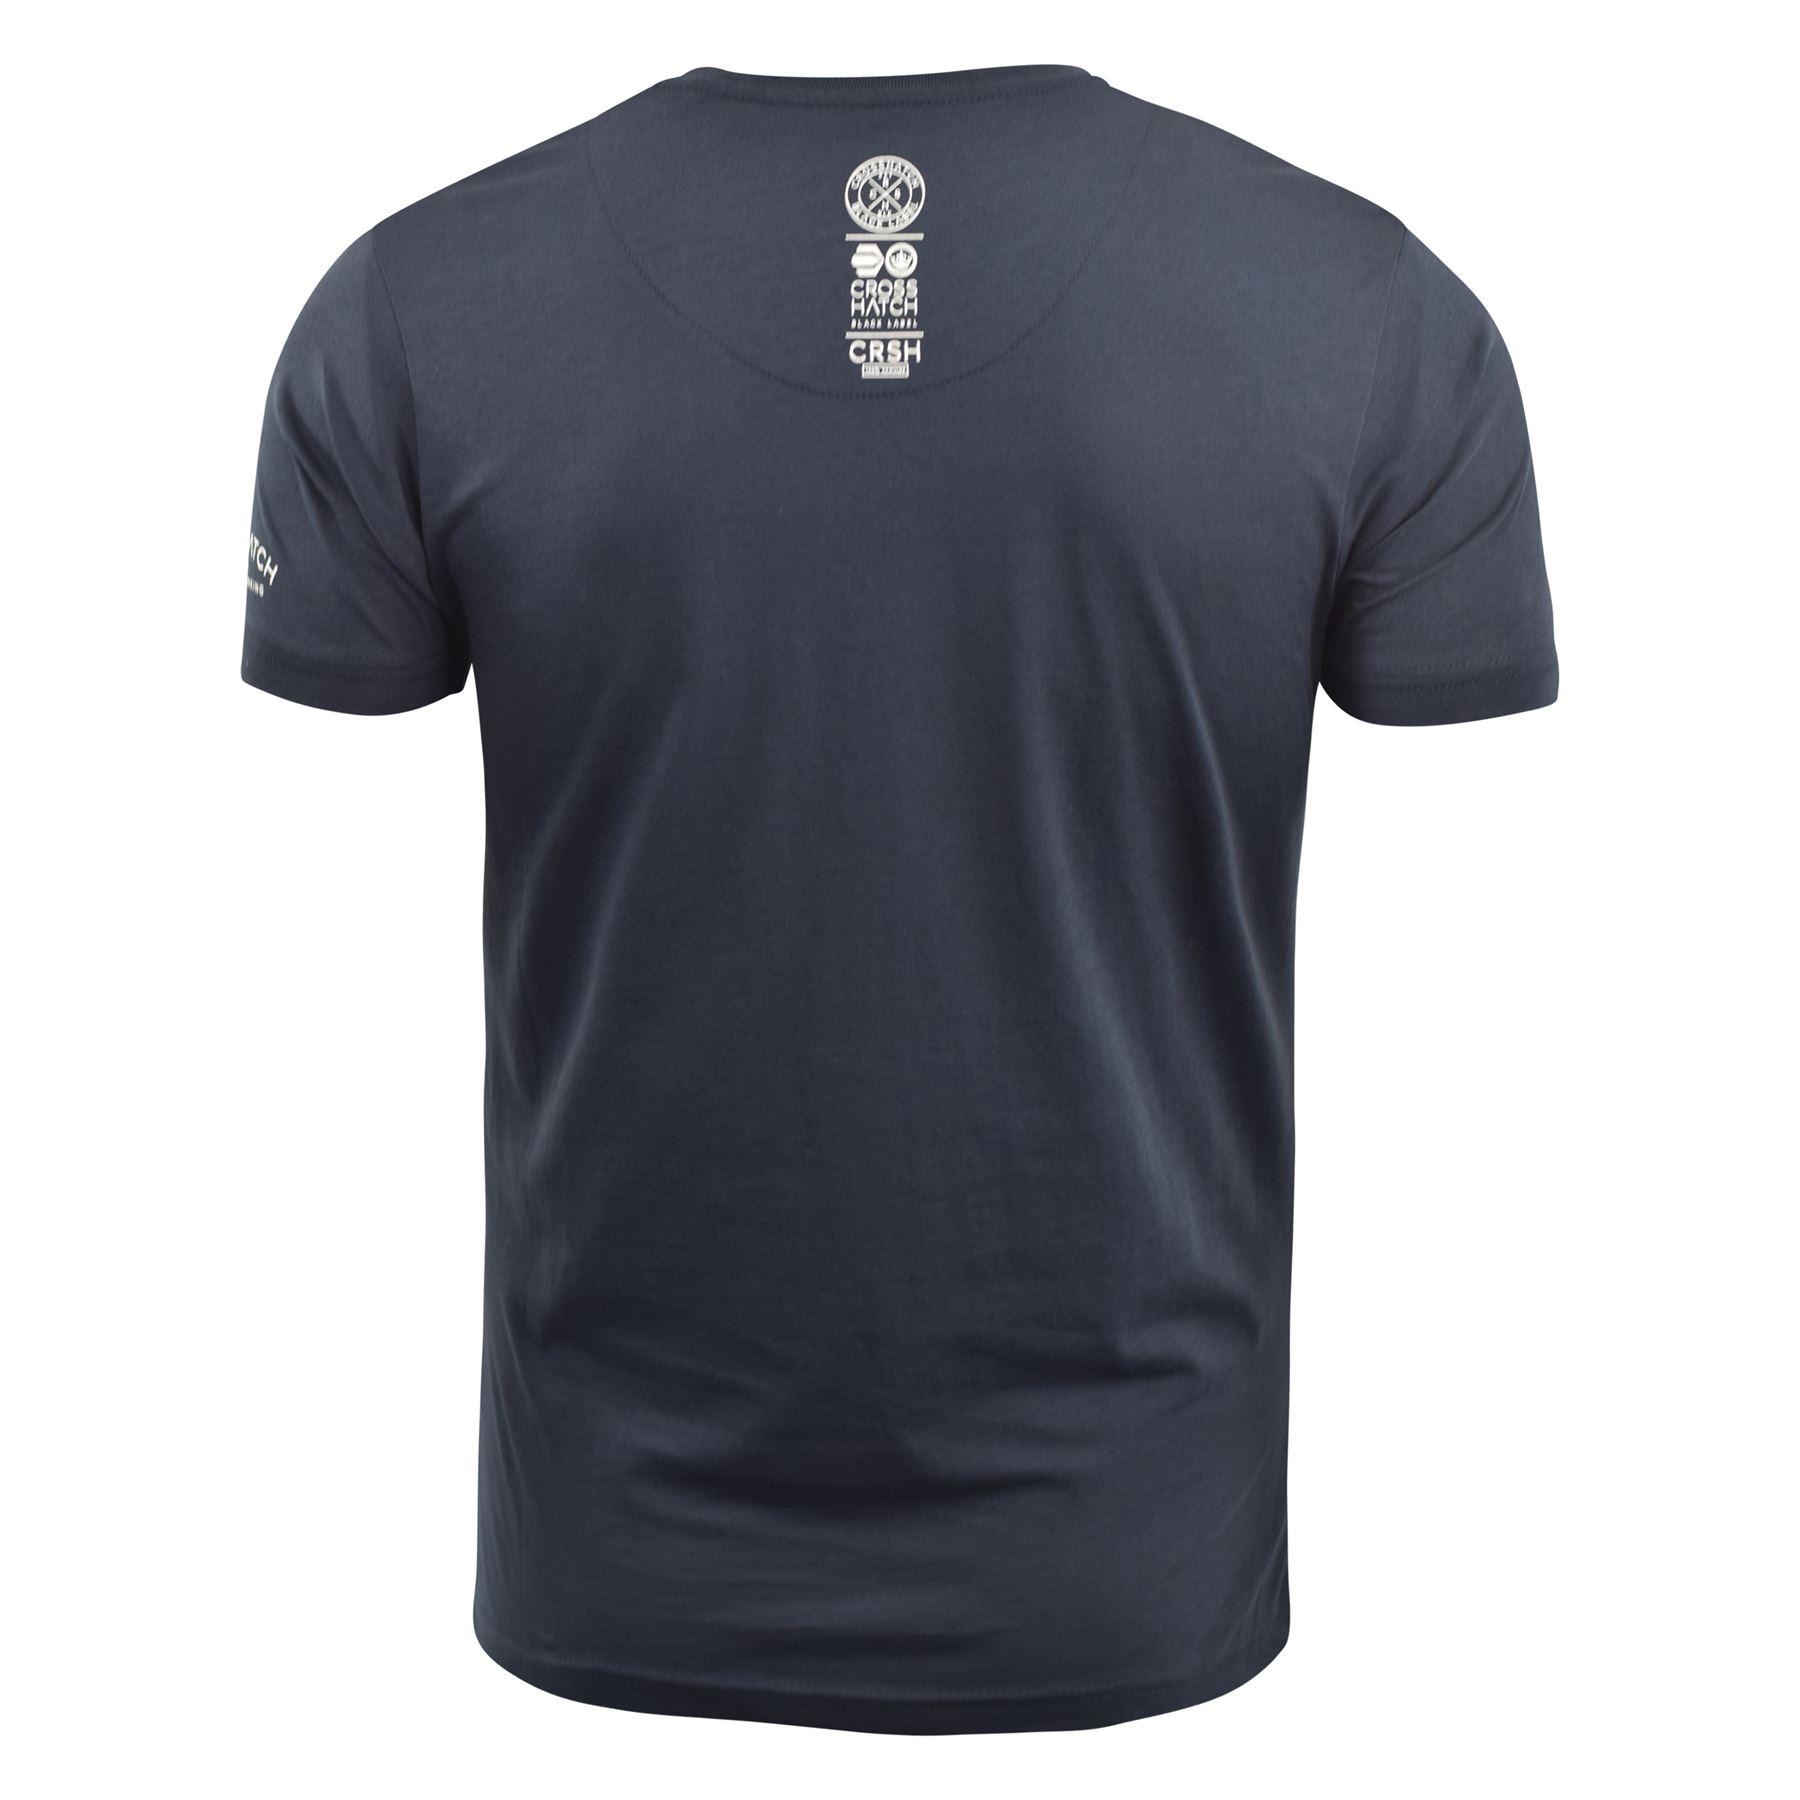 Mens-T-Shirt-Crosshatch-Short-Sleeve-Crew-Neck-Graphic-Tee-Top thumbnail 9